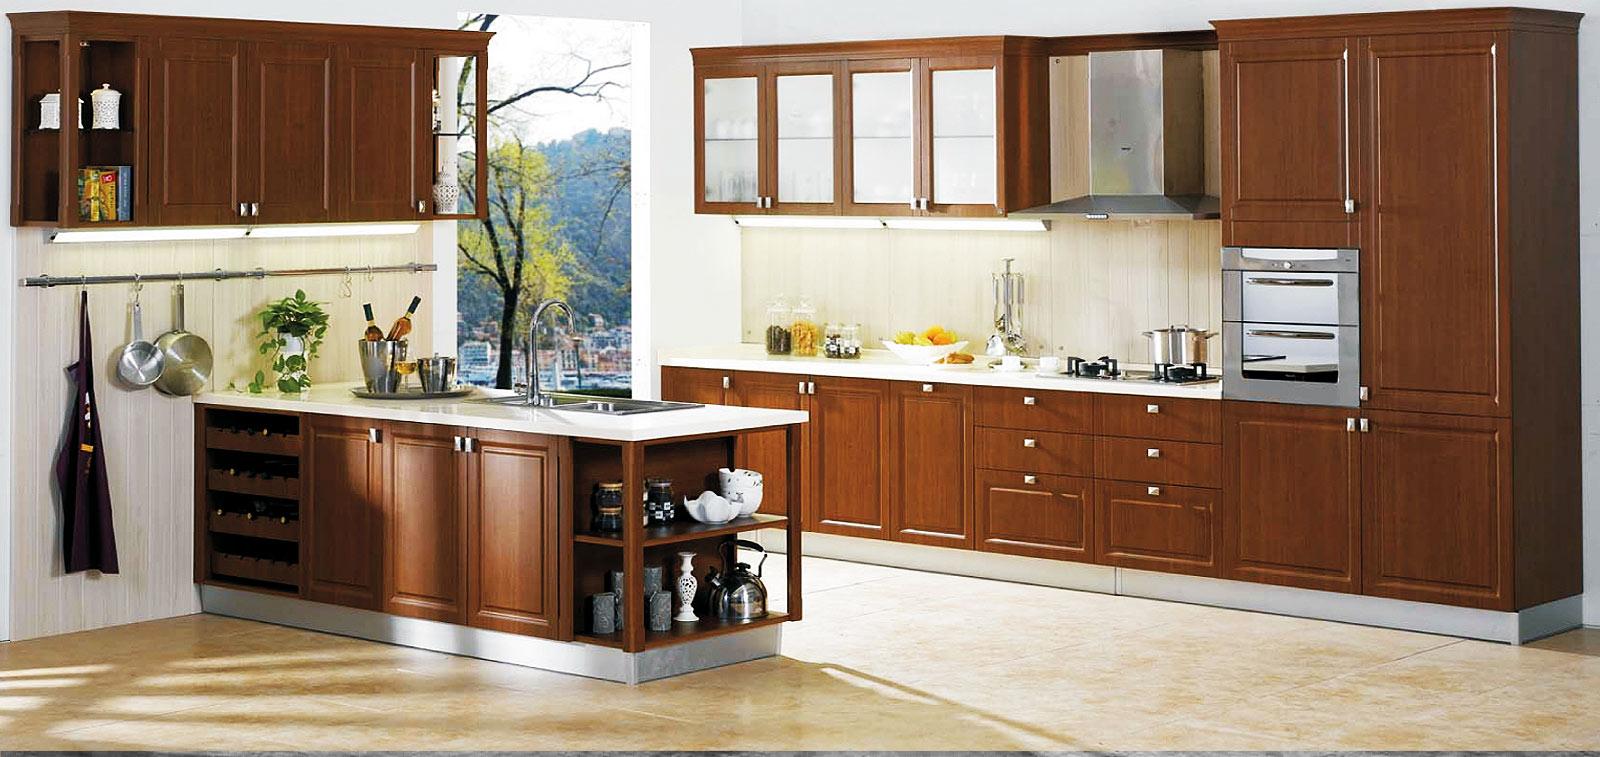 modulopbygget-køkken-designer-ludhiana